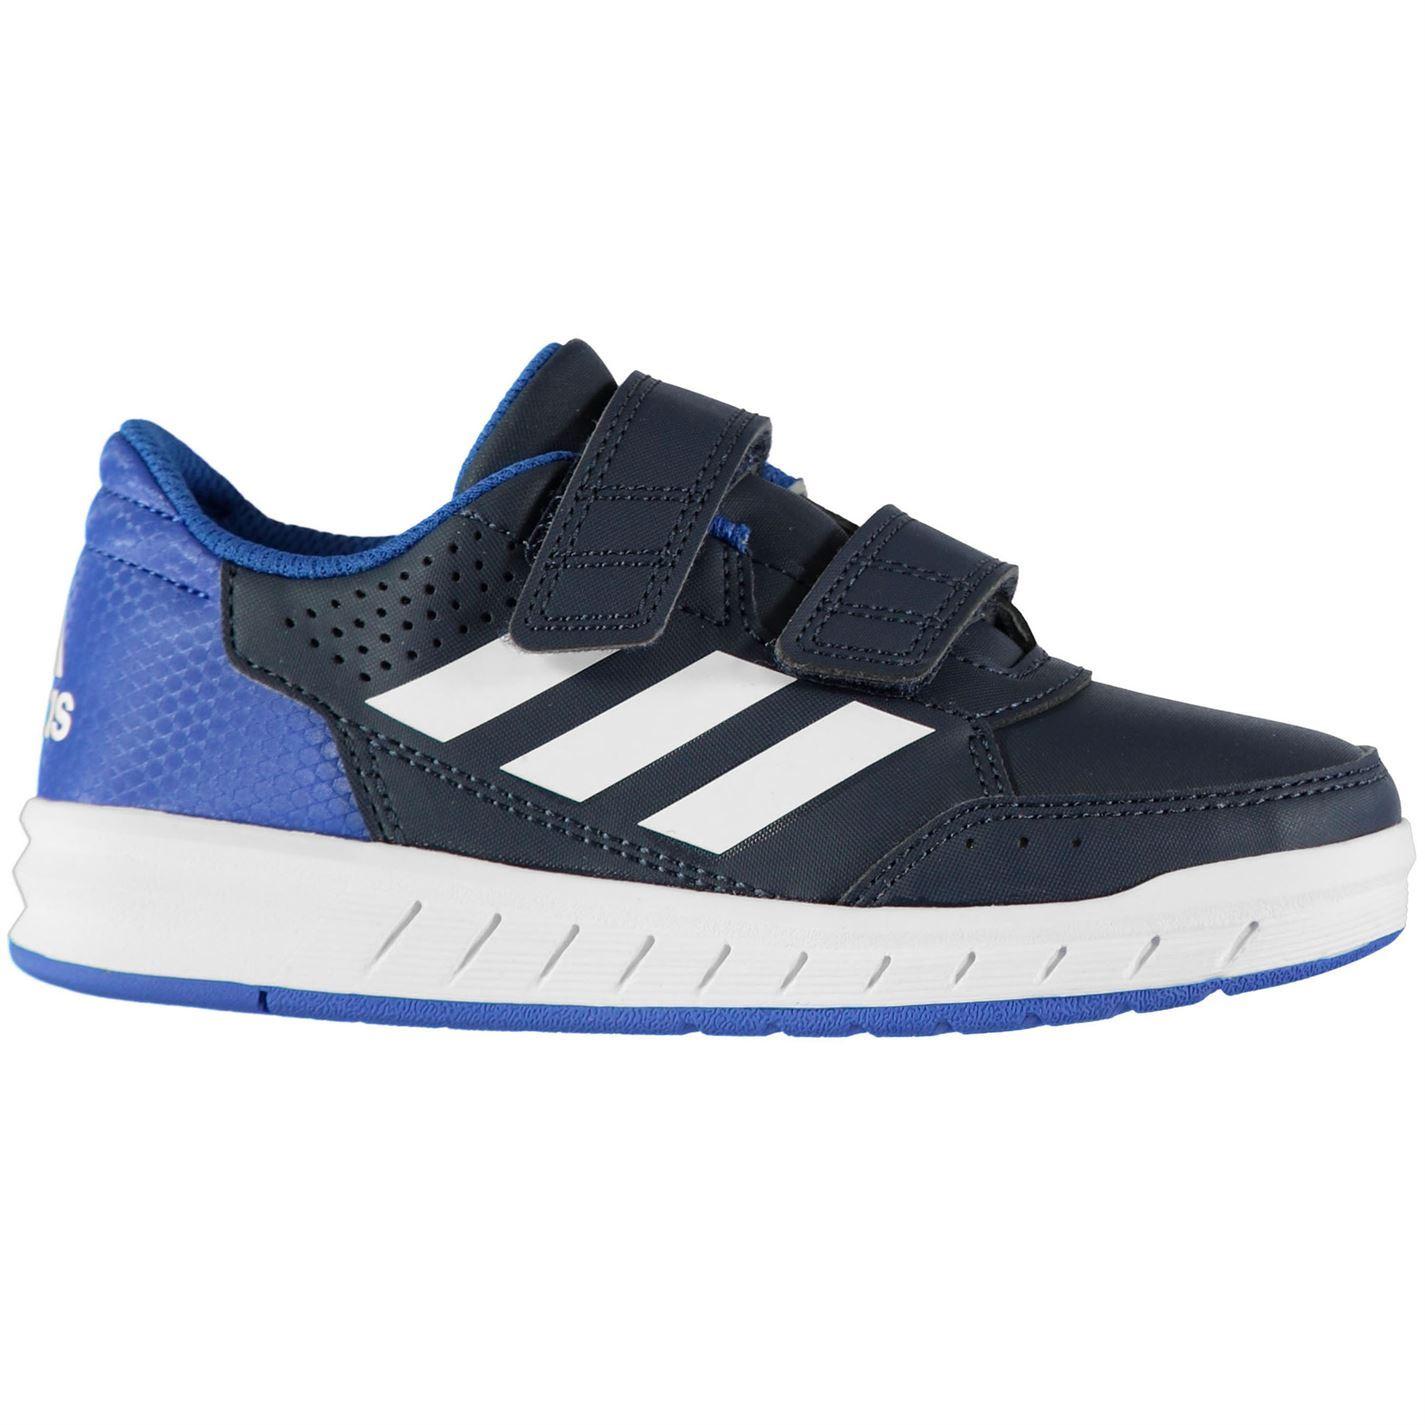 miniatura 11 - ADIDAS-alta-Sport-CF-Scarpe-da-ginnastica-bambino-ragazzo-calzature